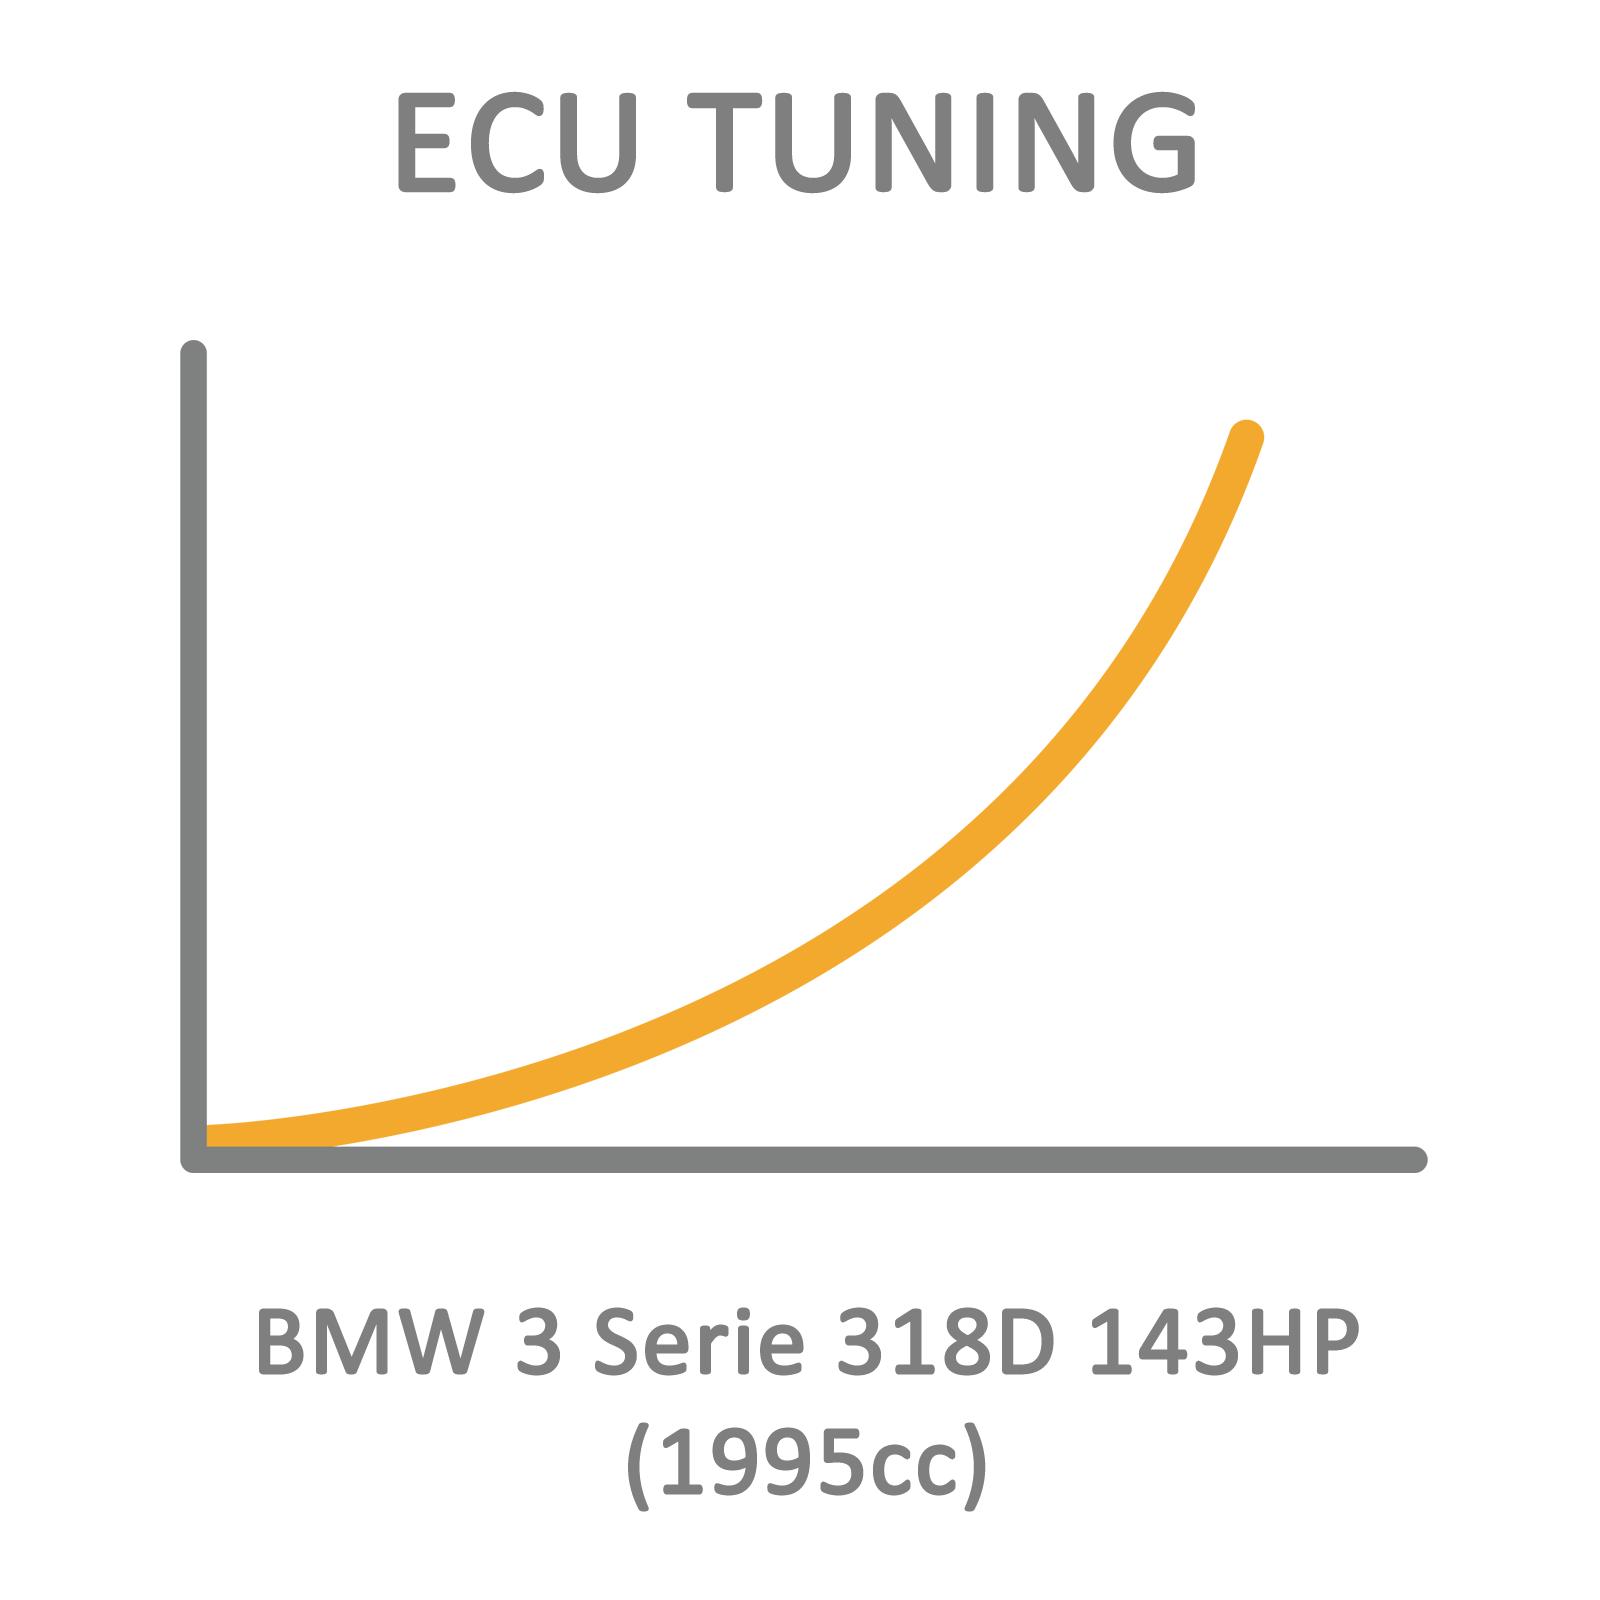 BMW 3 Series 318D 143HP (1995cc) ECU Tuning Remapping